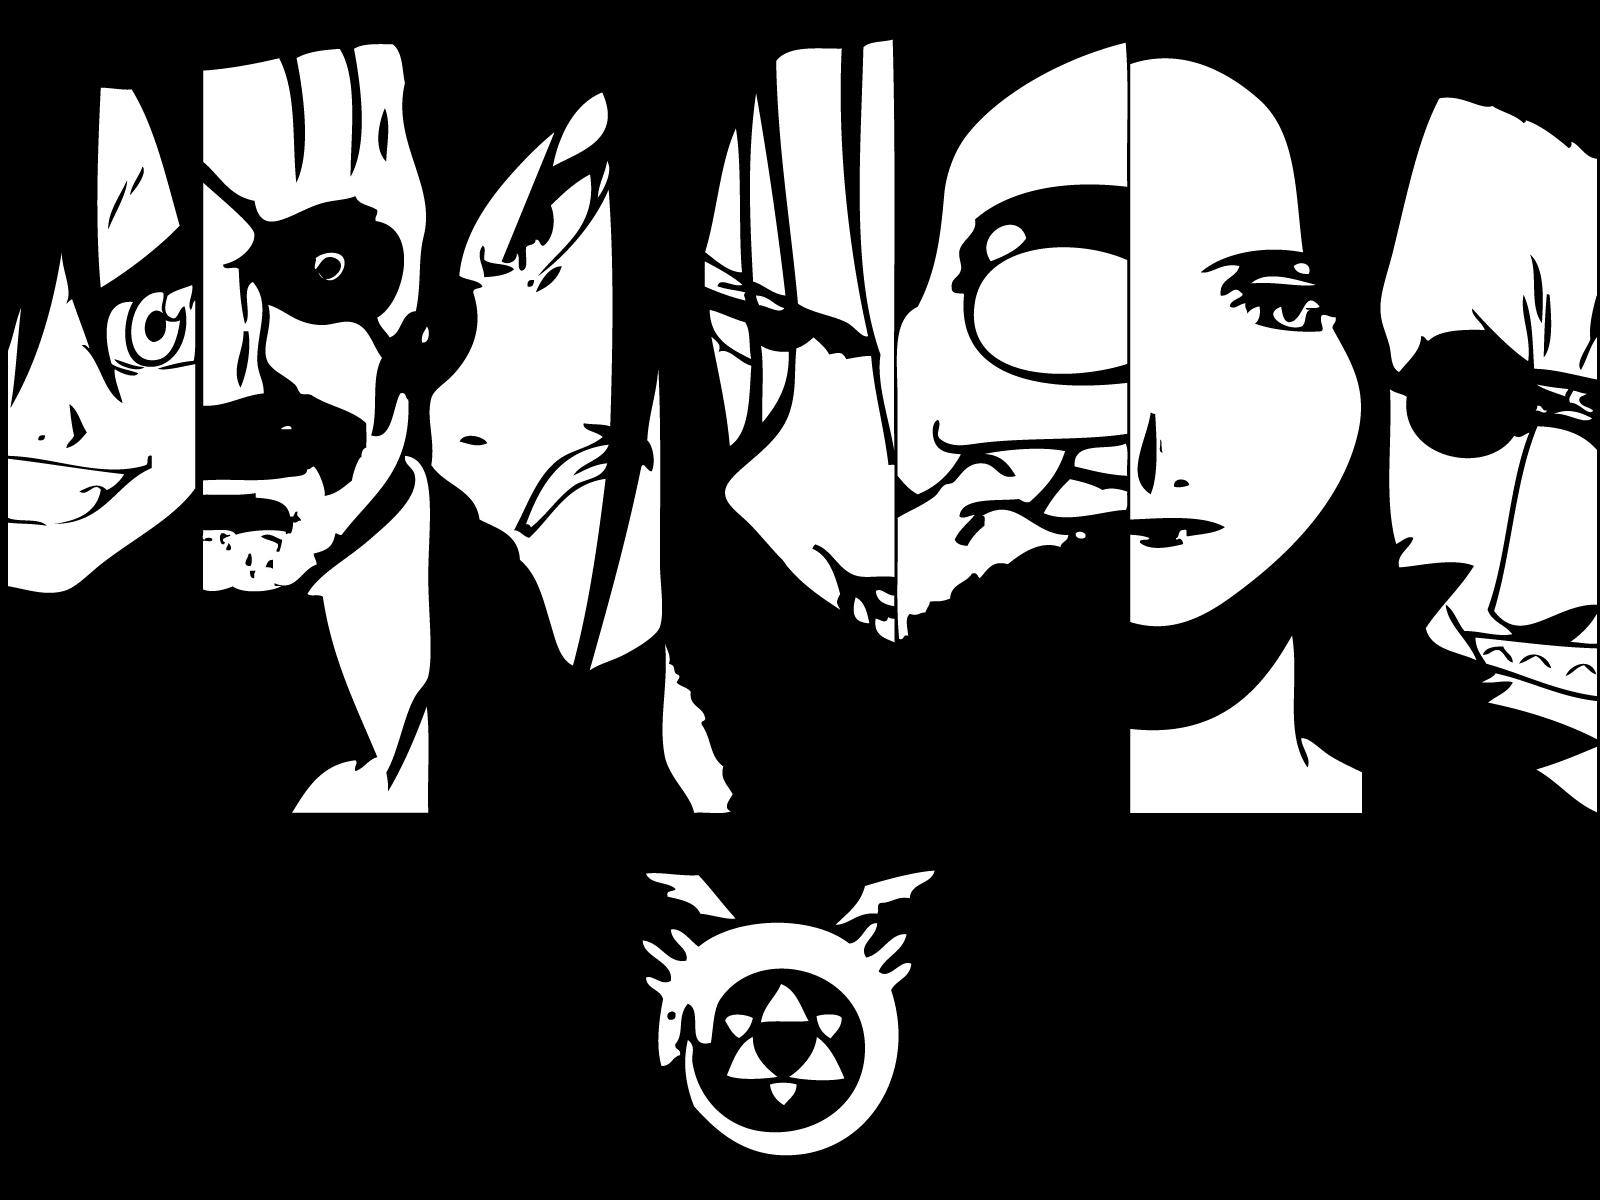 Good Wallpaper Logo Fullmetal Alchemist - Homunculi  Trends_152780.jpg